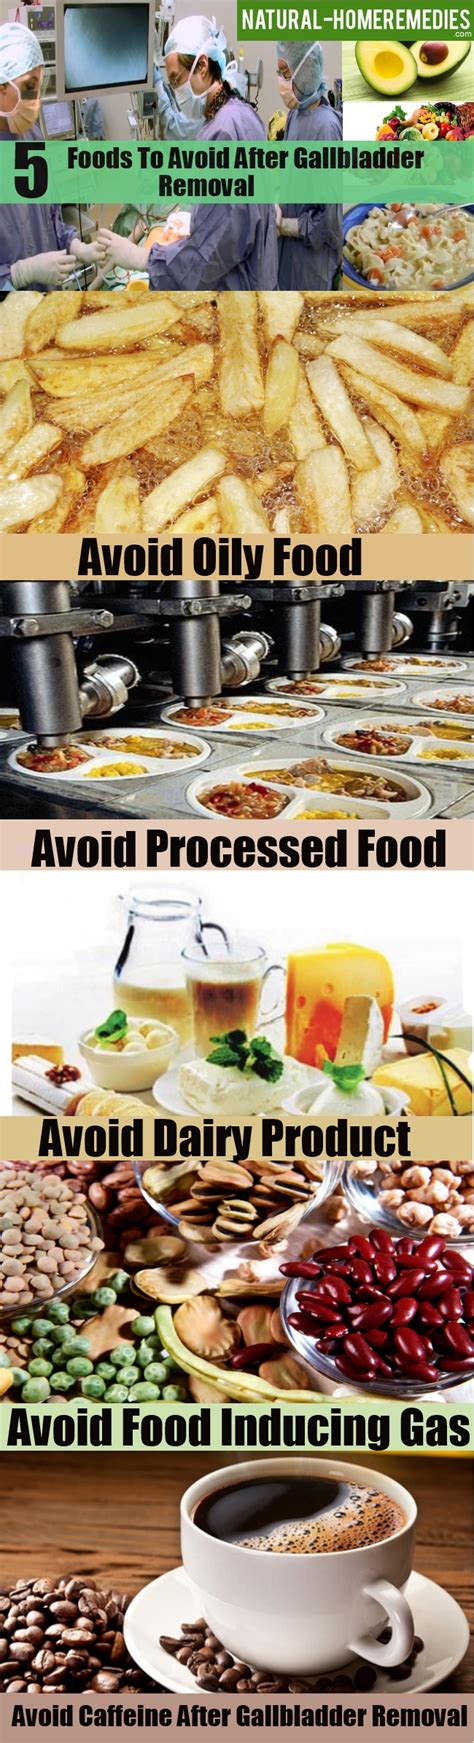 supplement after gallbladder removal 5 foods to avoid after gallbladder removal diet to avoid